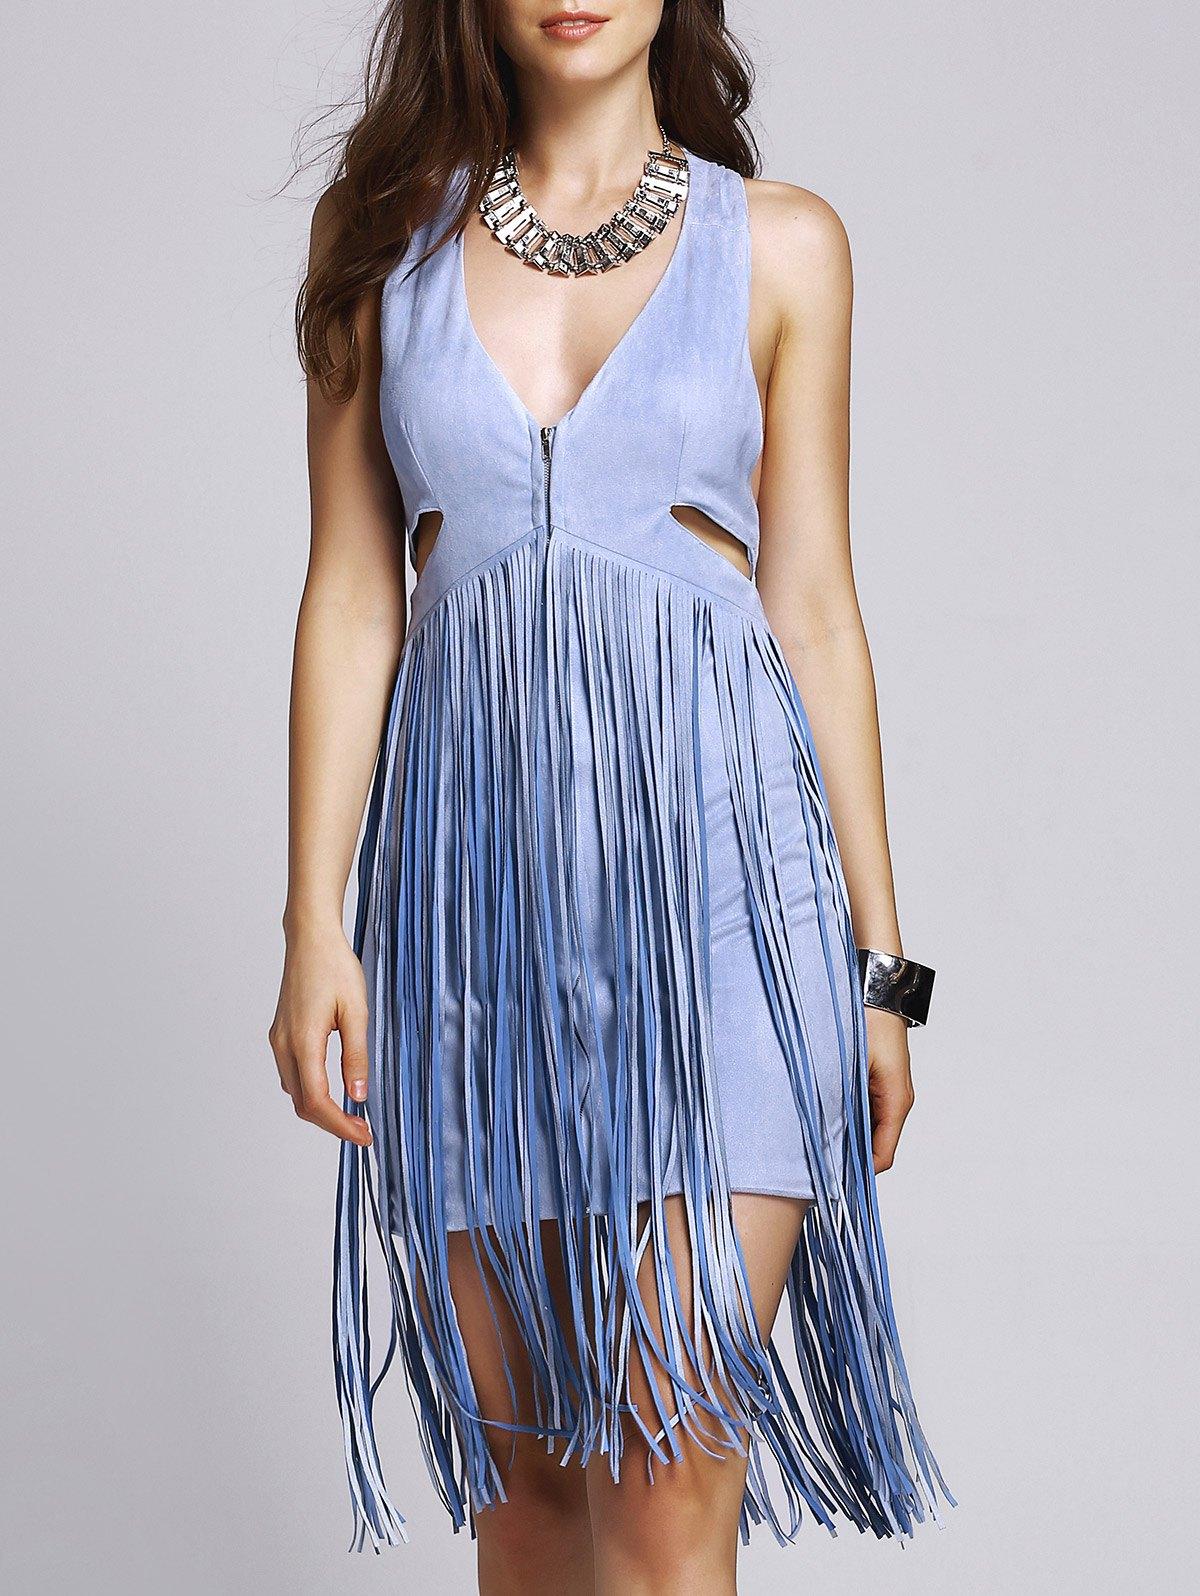 Plunging Neck Sleeveless Blue Tassels Dress